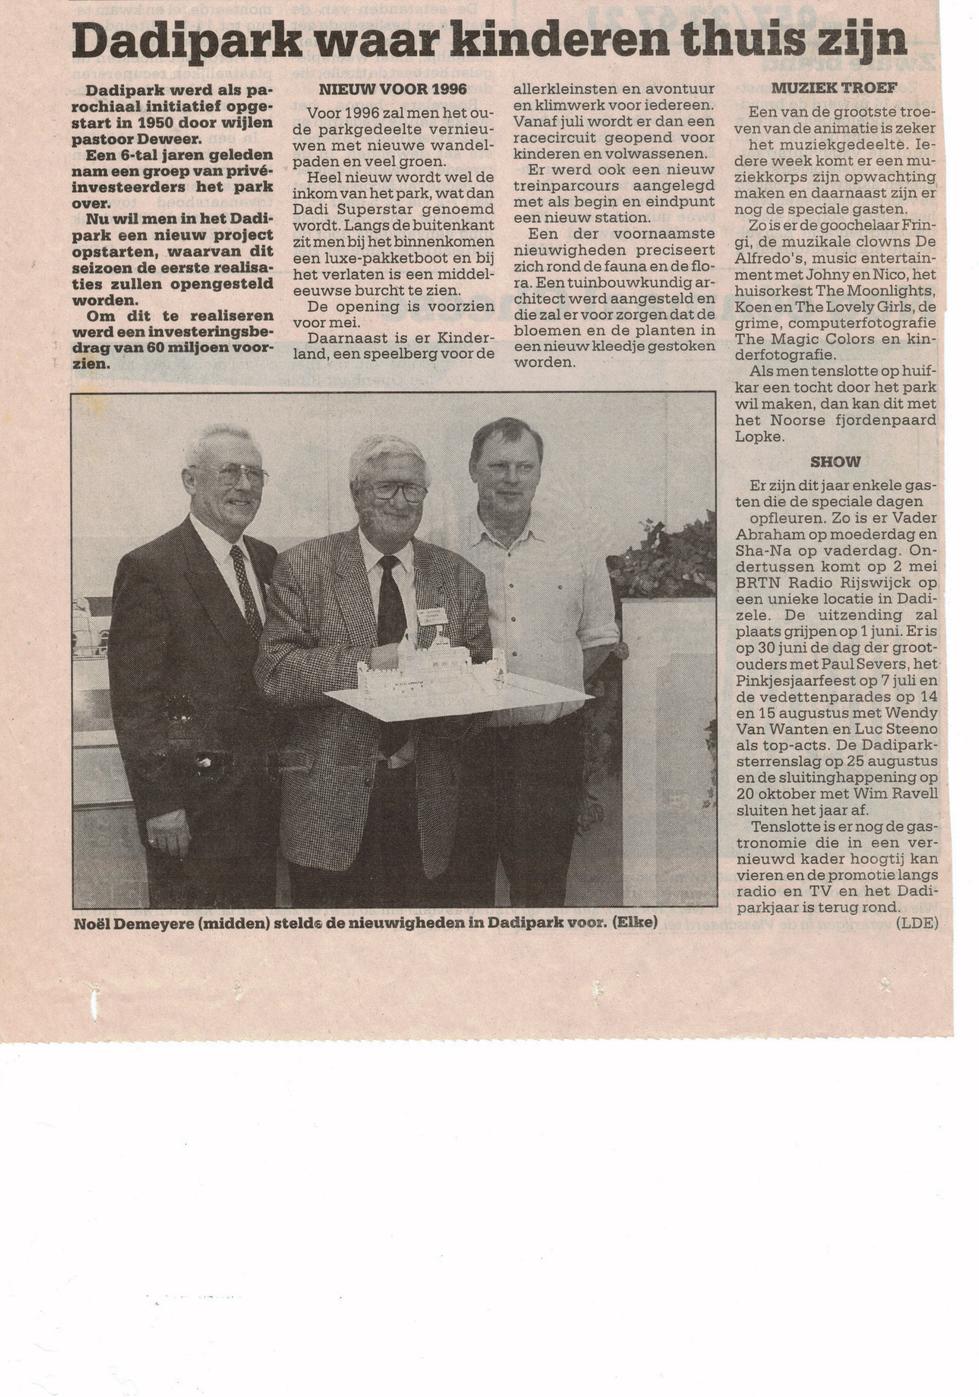 Dadipark krantenartikels_Pagina_04.png